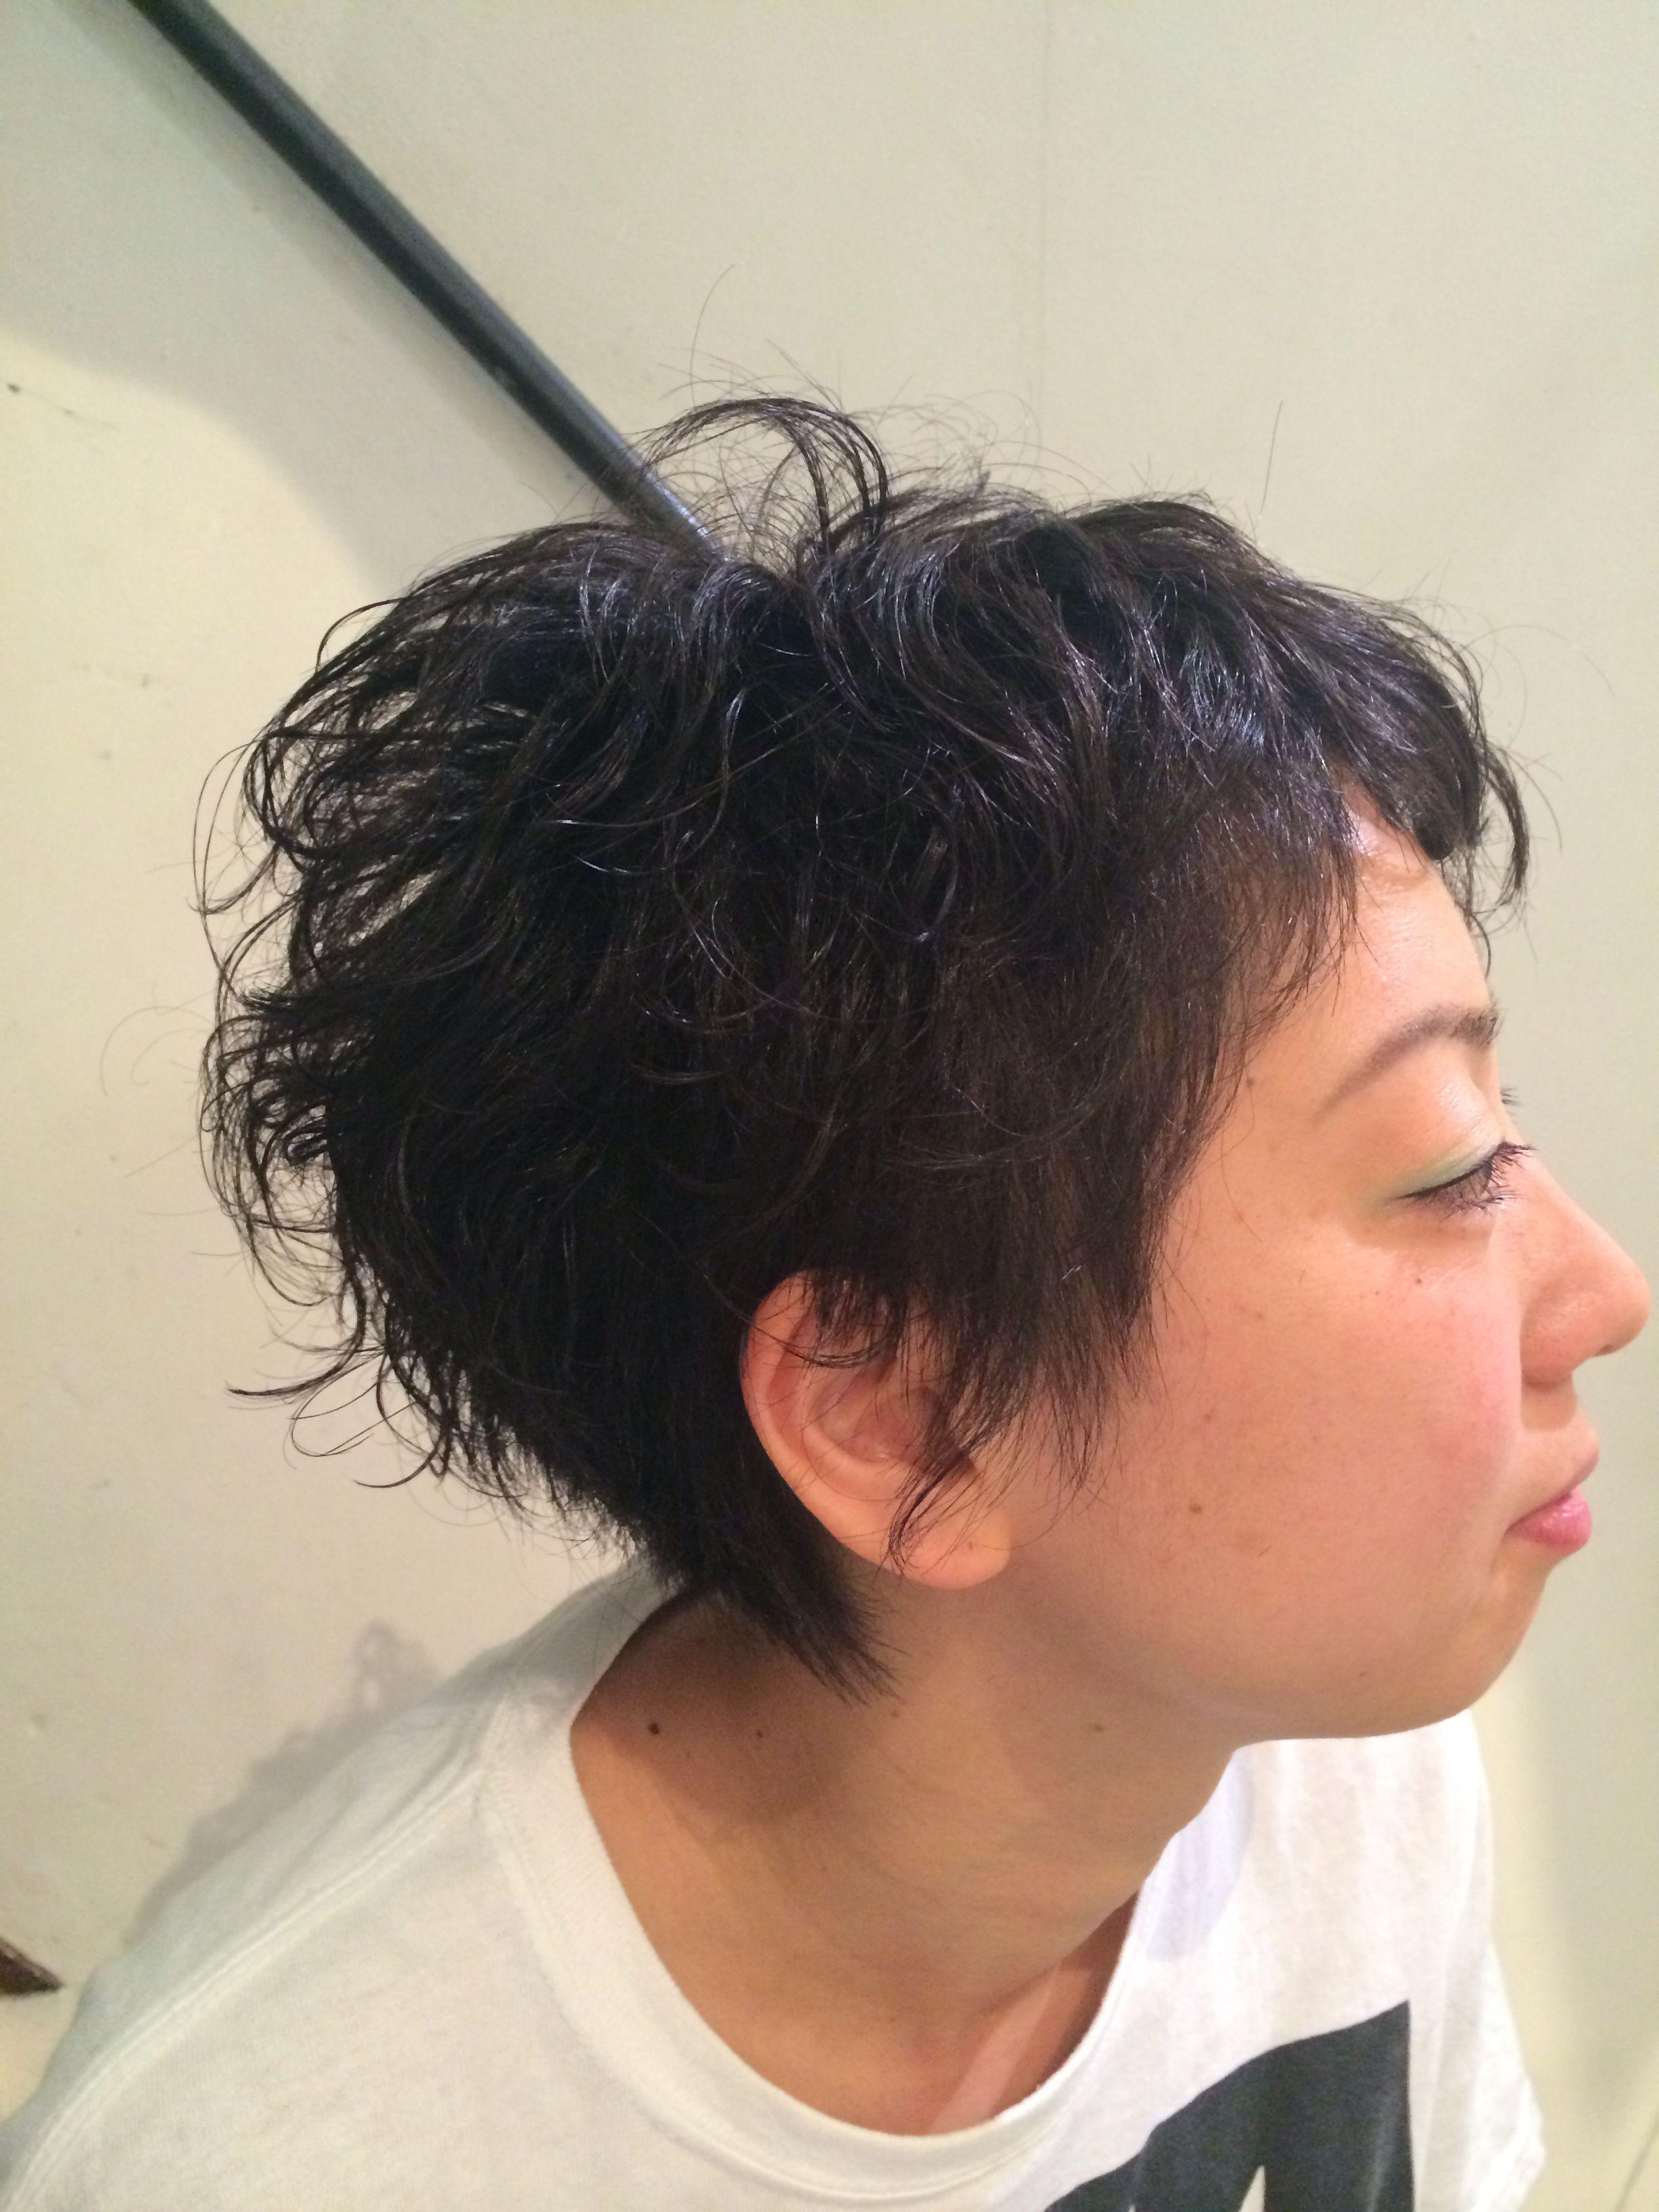 Boy hairstyle short short hair boy attic tokyo  fashon  pinterest  attic and short hair